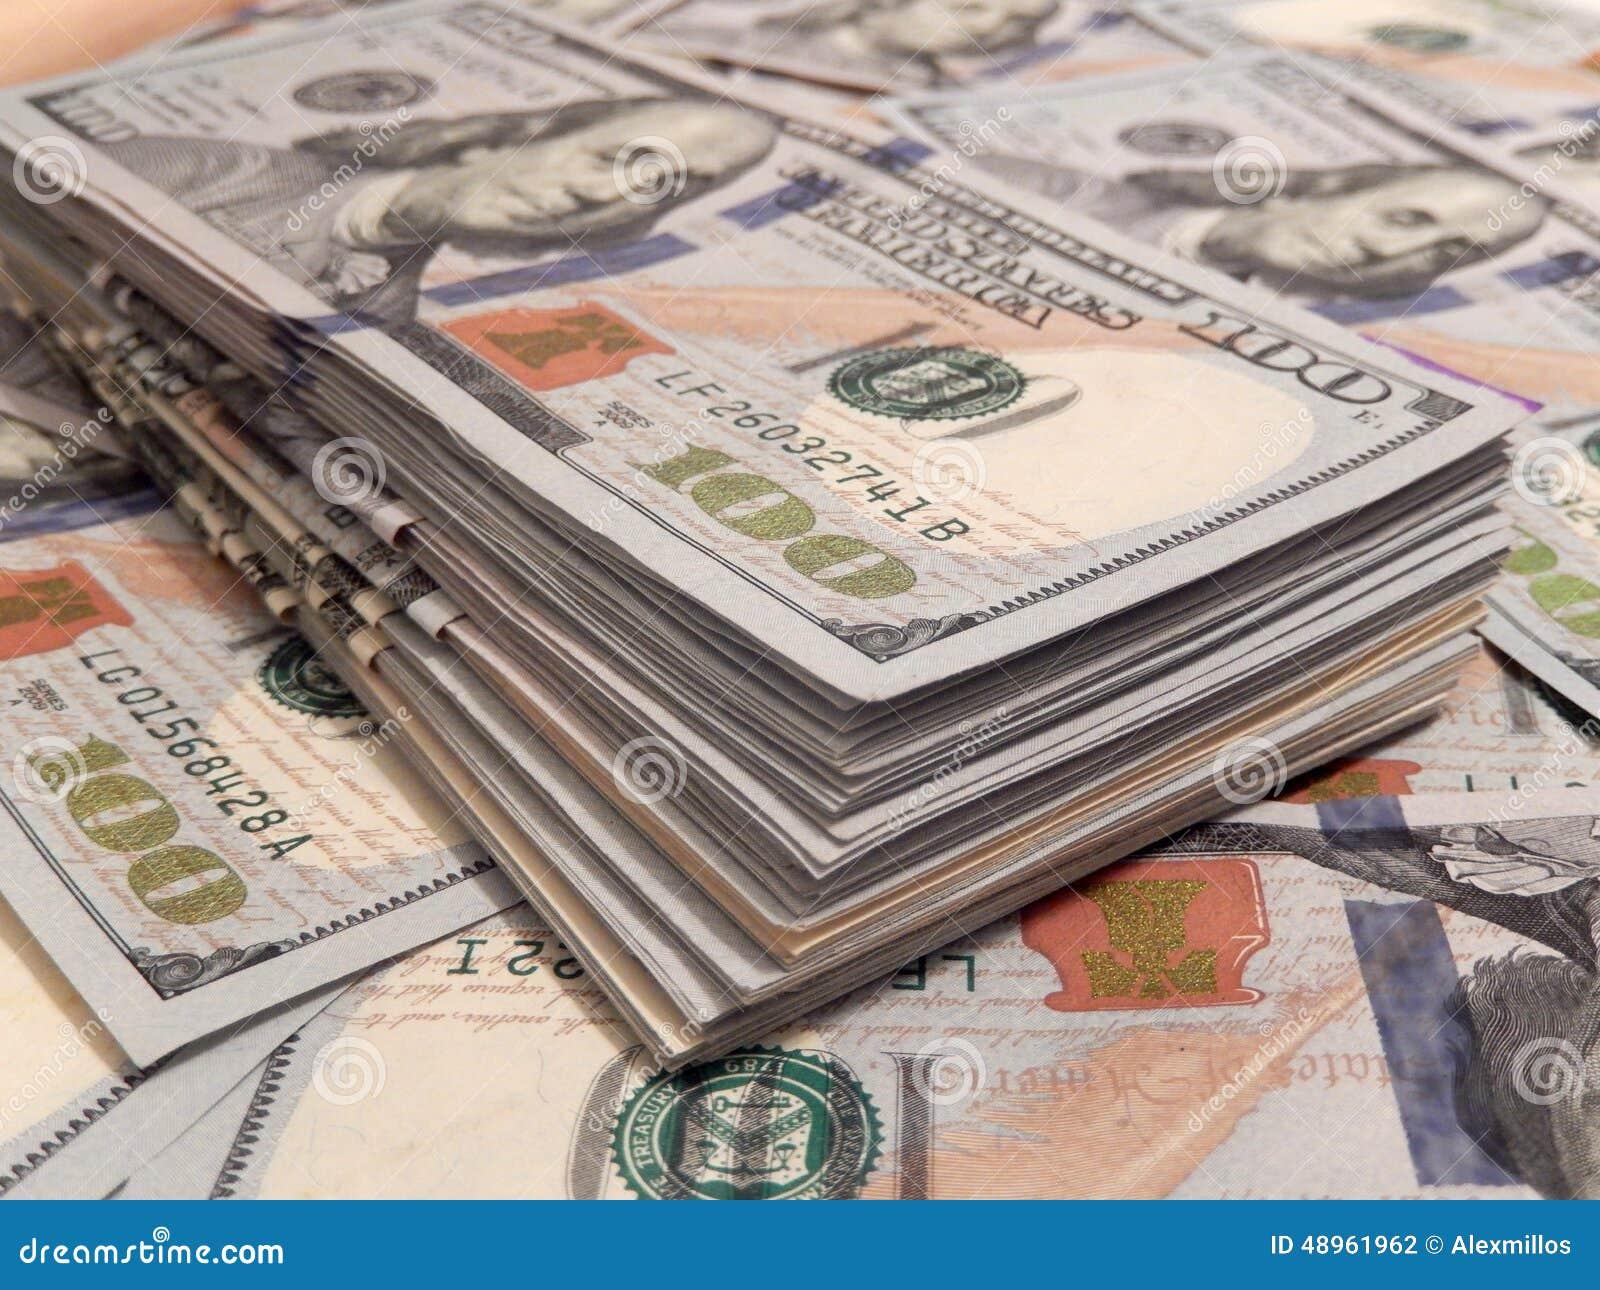 Stack Of Money 100 Dollars Bill : New one hundred dollar bills stack stock photo image of